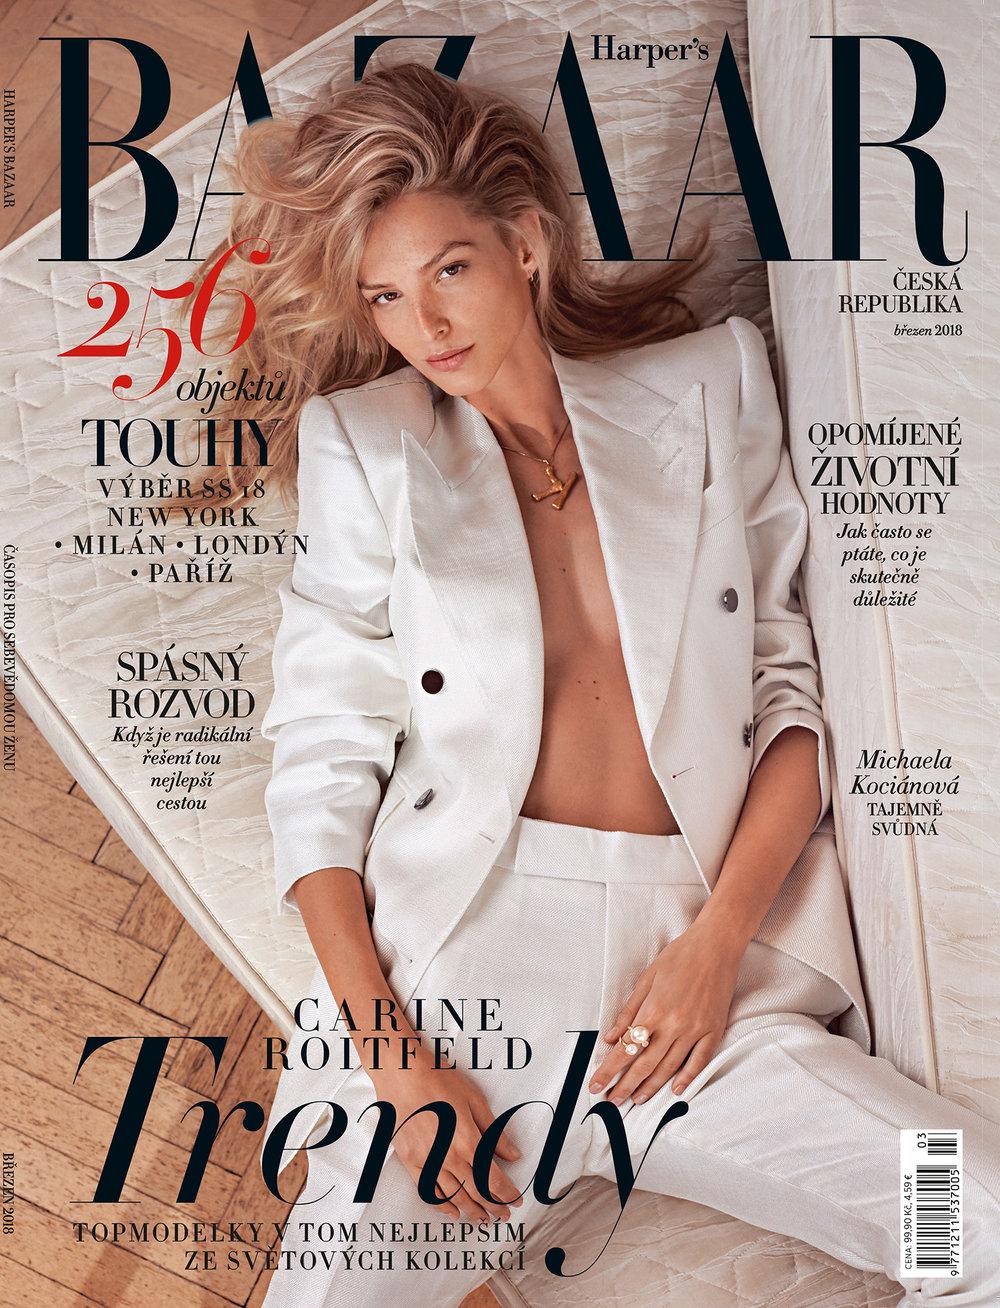 ICloud Michaela Kocianova nudes (21 photo), Topless, Hot, Boobs, butt 2018